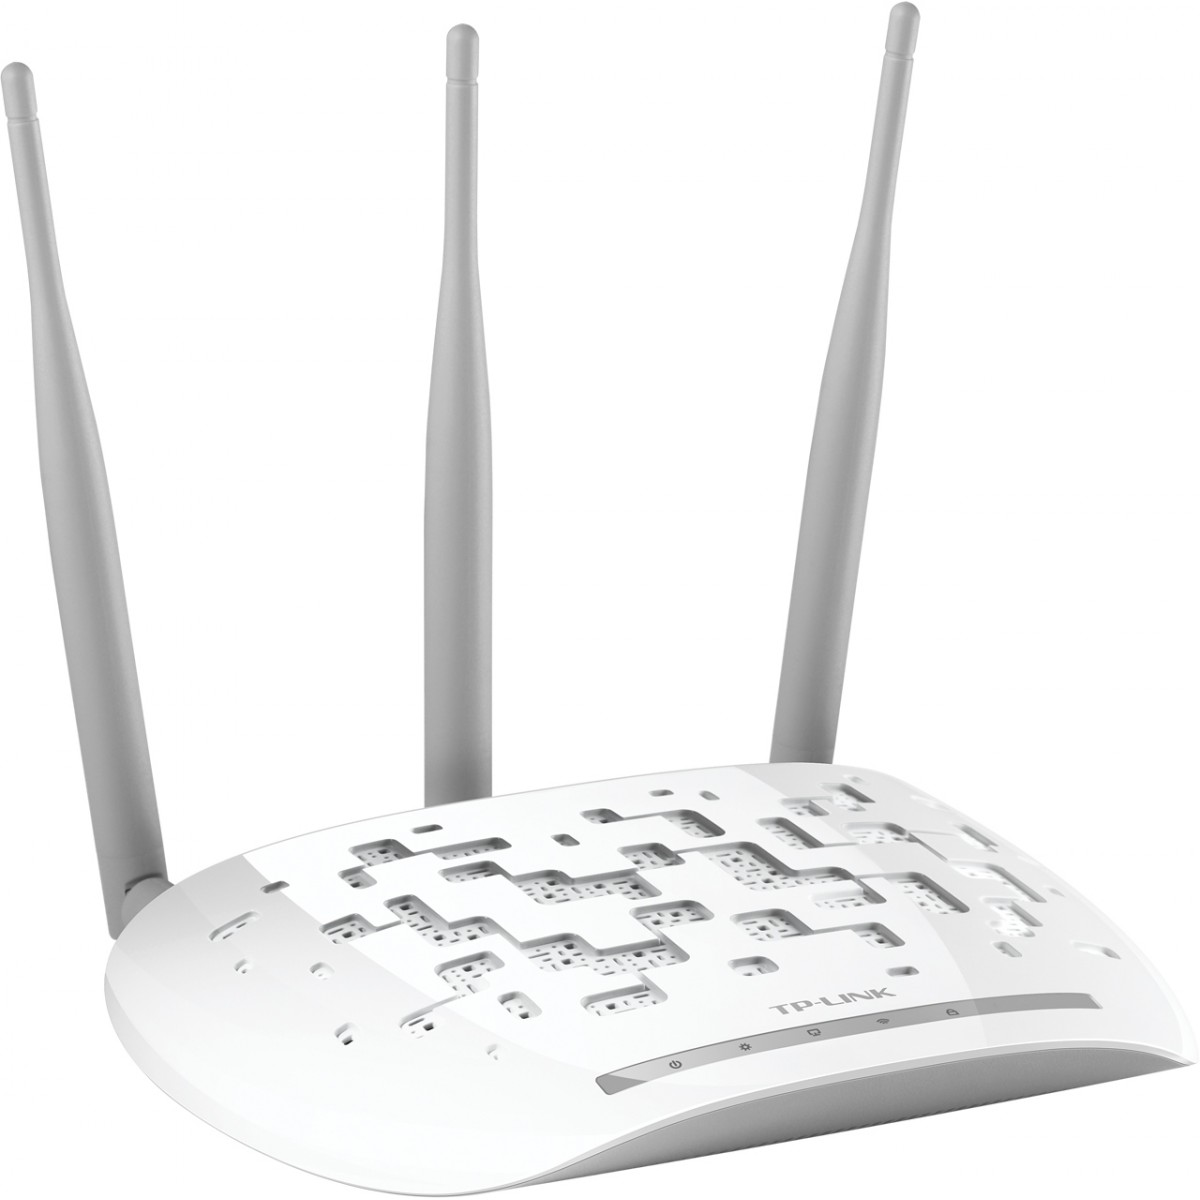 Access Point Wireless TL-WA901ND 300Mbps Extensão de Sinal - Tplink